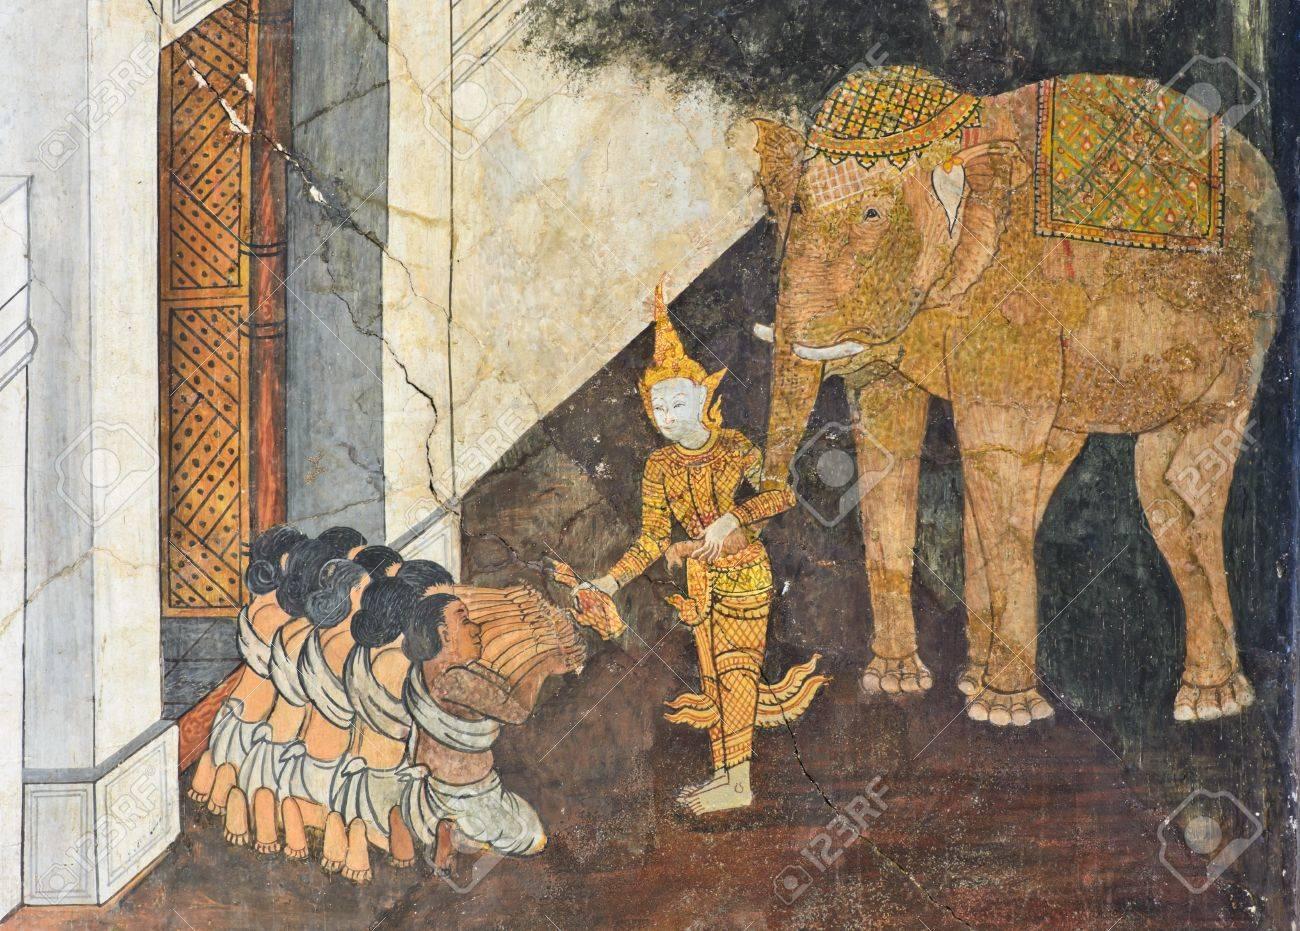 native thai mural depict a previous life of buddha stock photo native thai mural depict a previous life of buddha stock photo 15950889